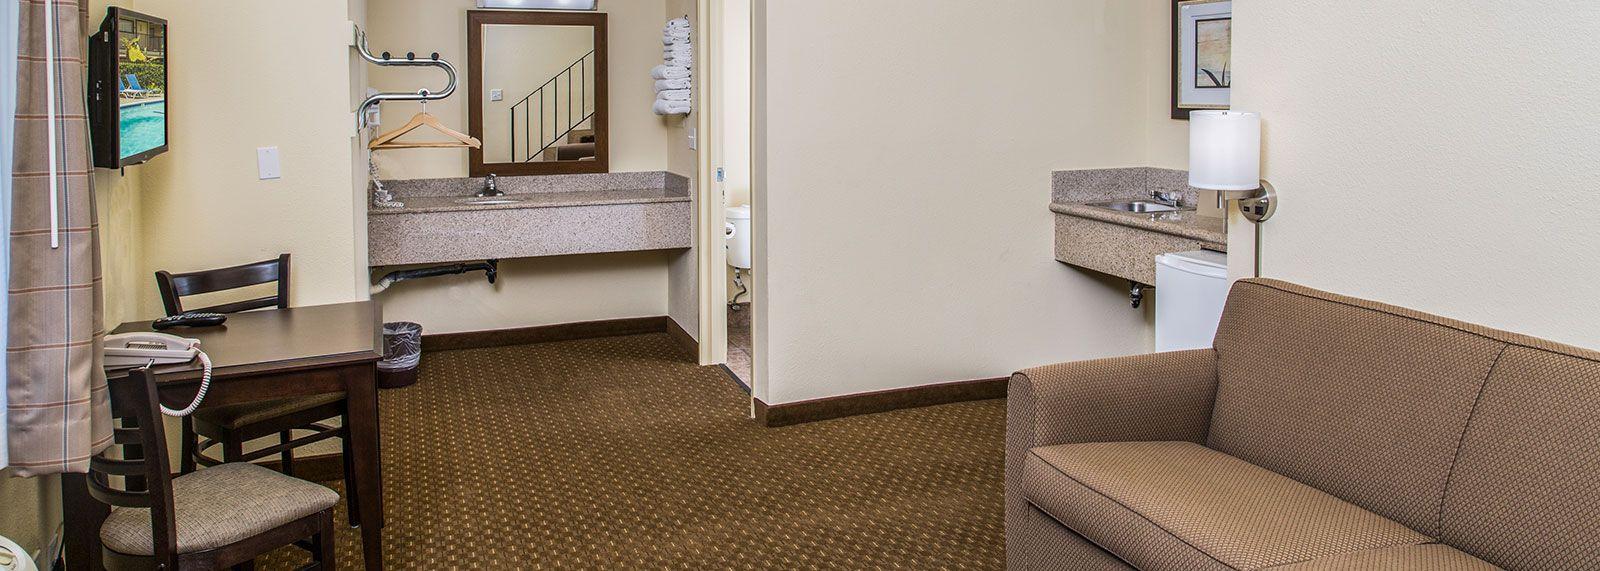 key-inn-and-suites-tustin-california-home3-top